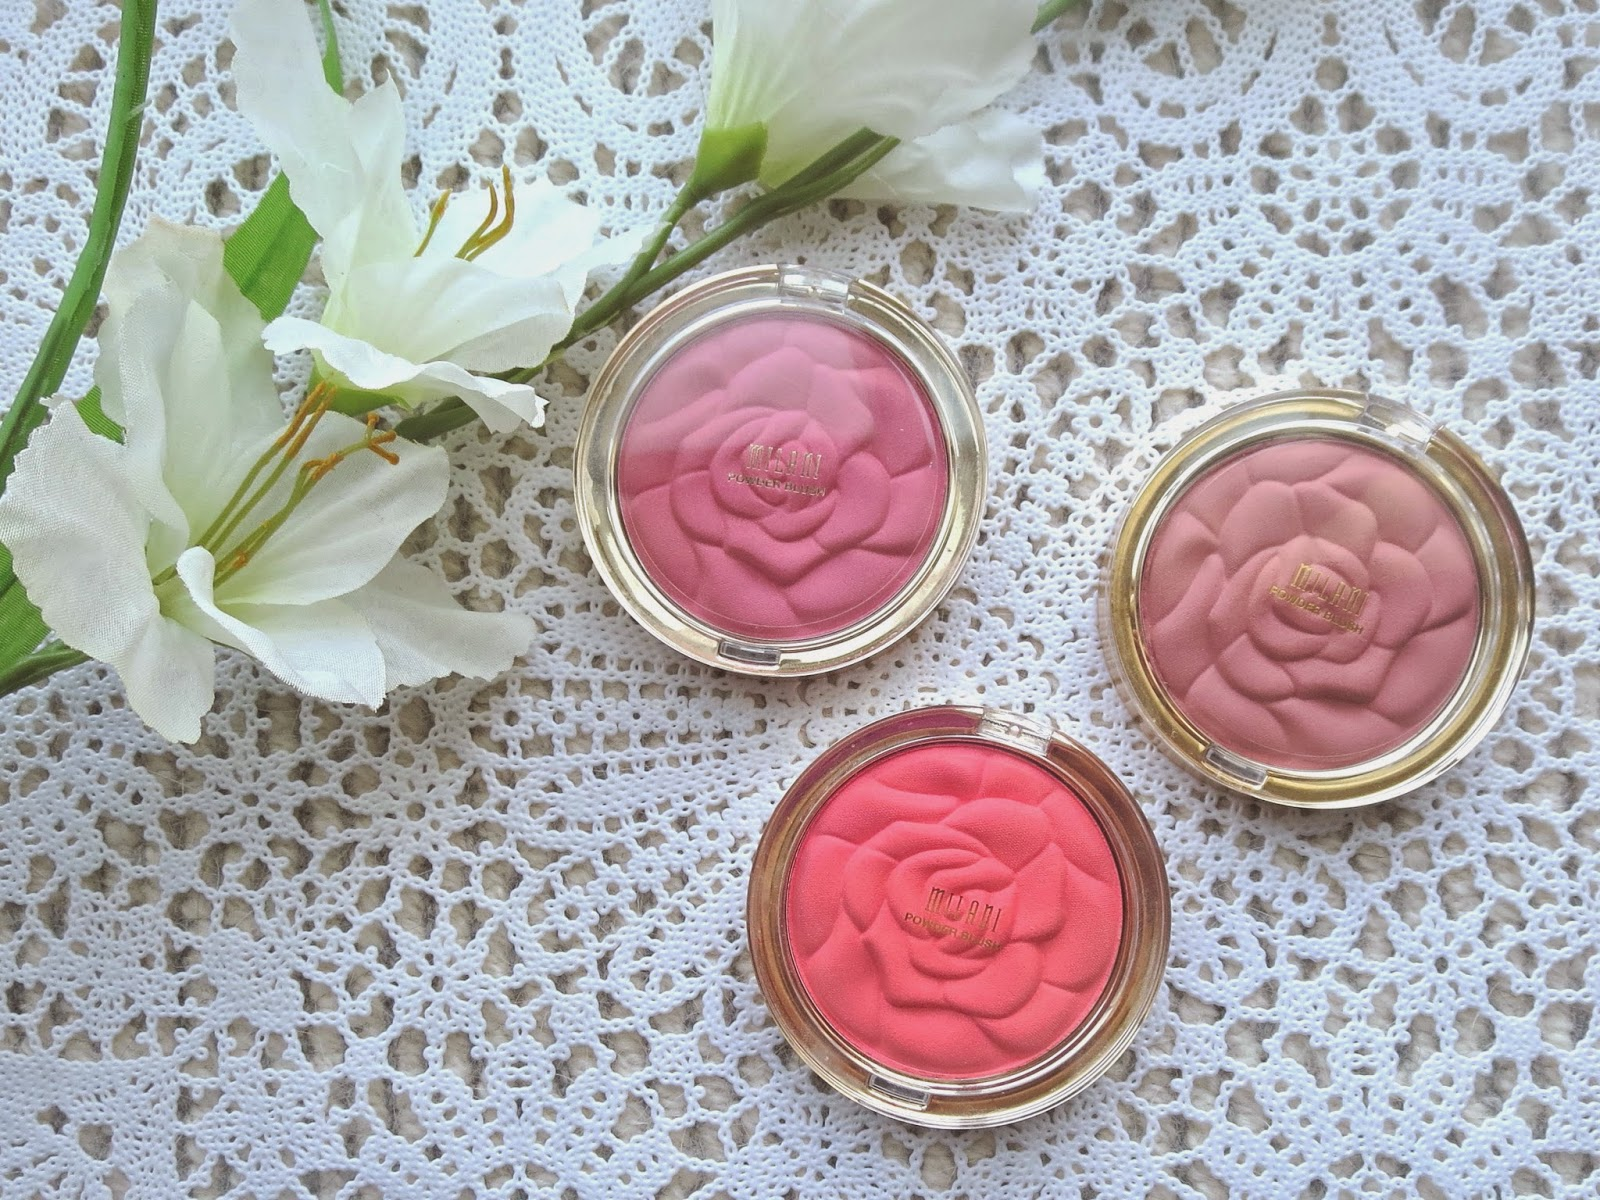 a picture of Milani Rose Powder Blush ; Tea Rose, Romantic Rose, Coral Cove